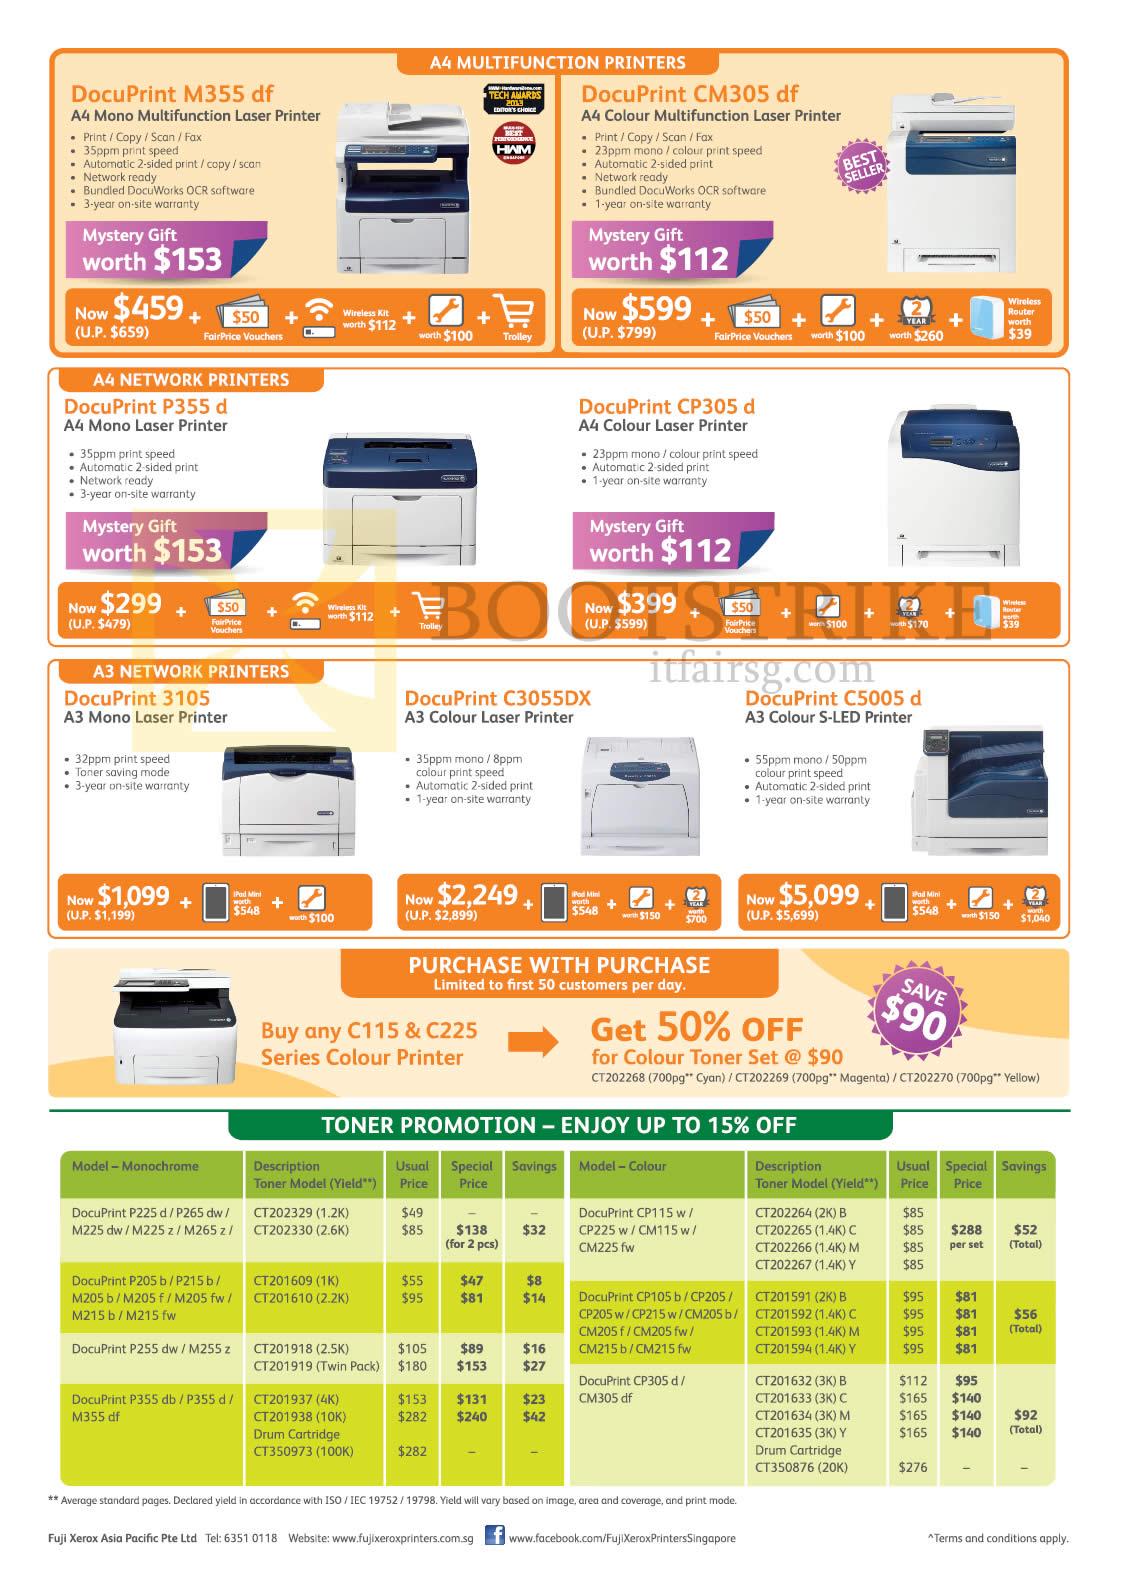 Fuji Xerox Printers Laser, Toner, DocuPrint M355df, CM305df